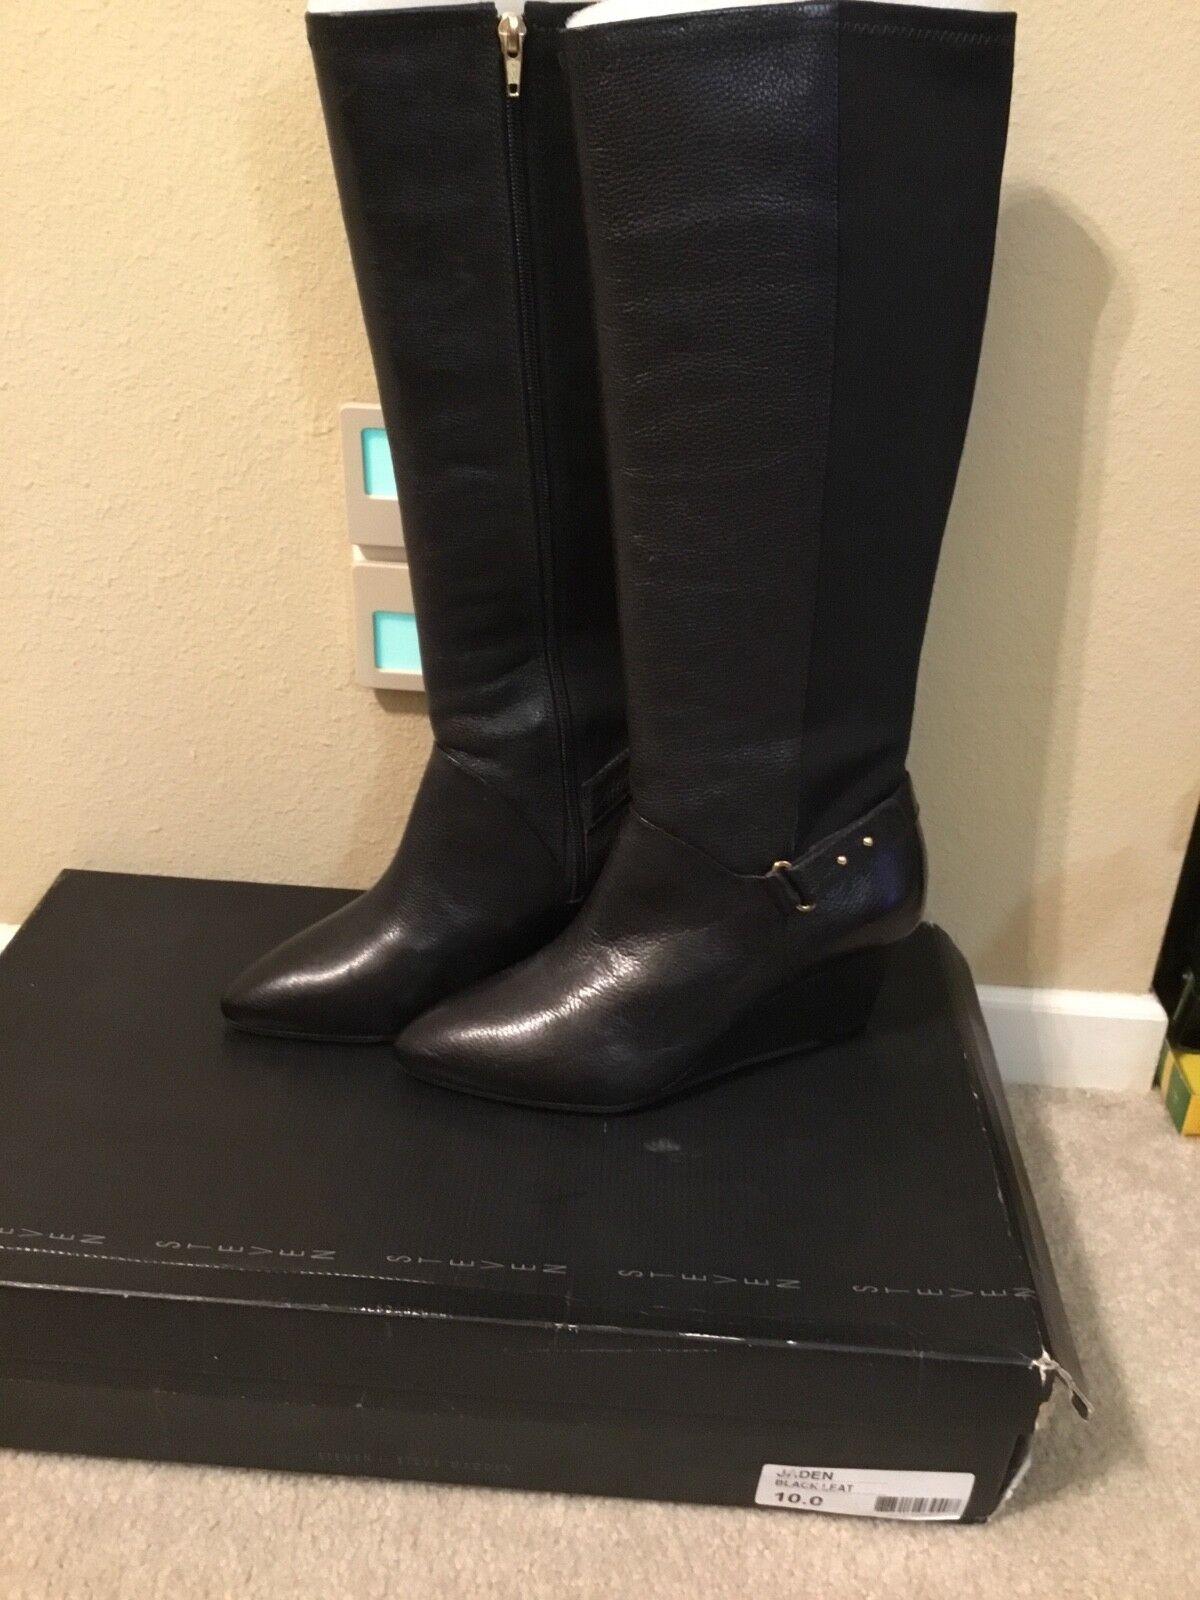 STEVEN By Steve Madden Femmes Jaden en cuir noir compensé bottes hautes 10 M neuf avec boite